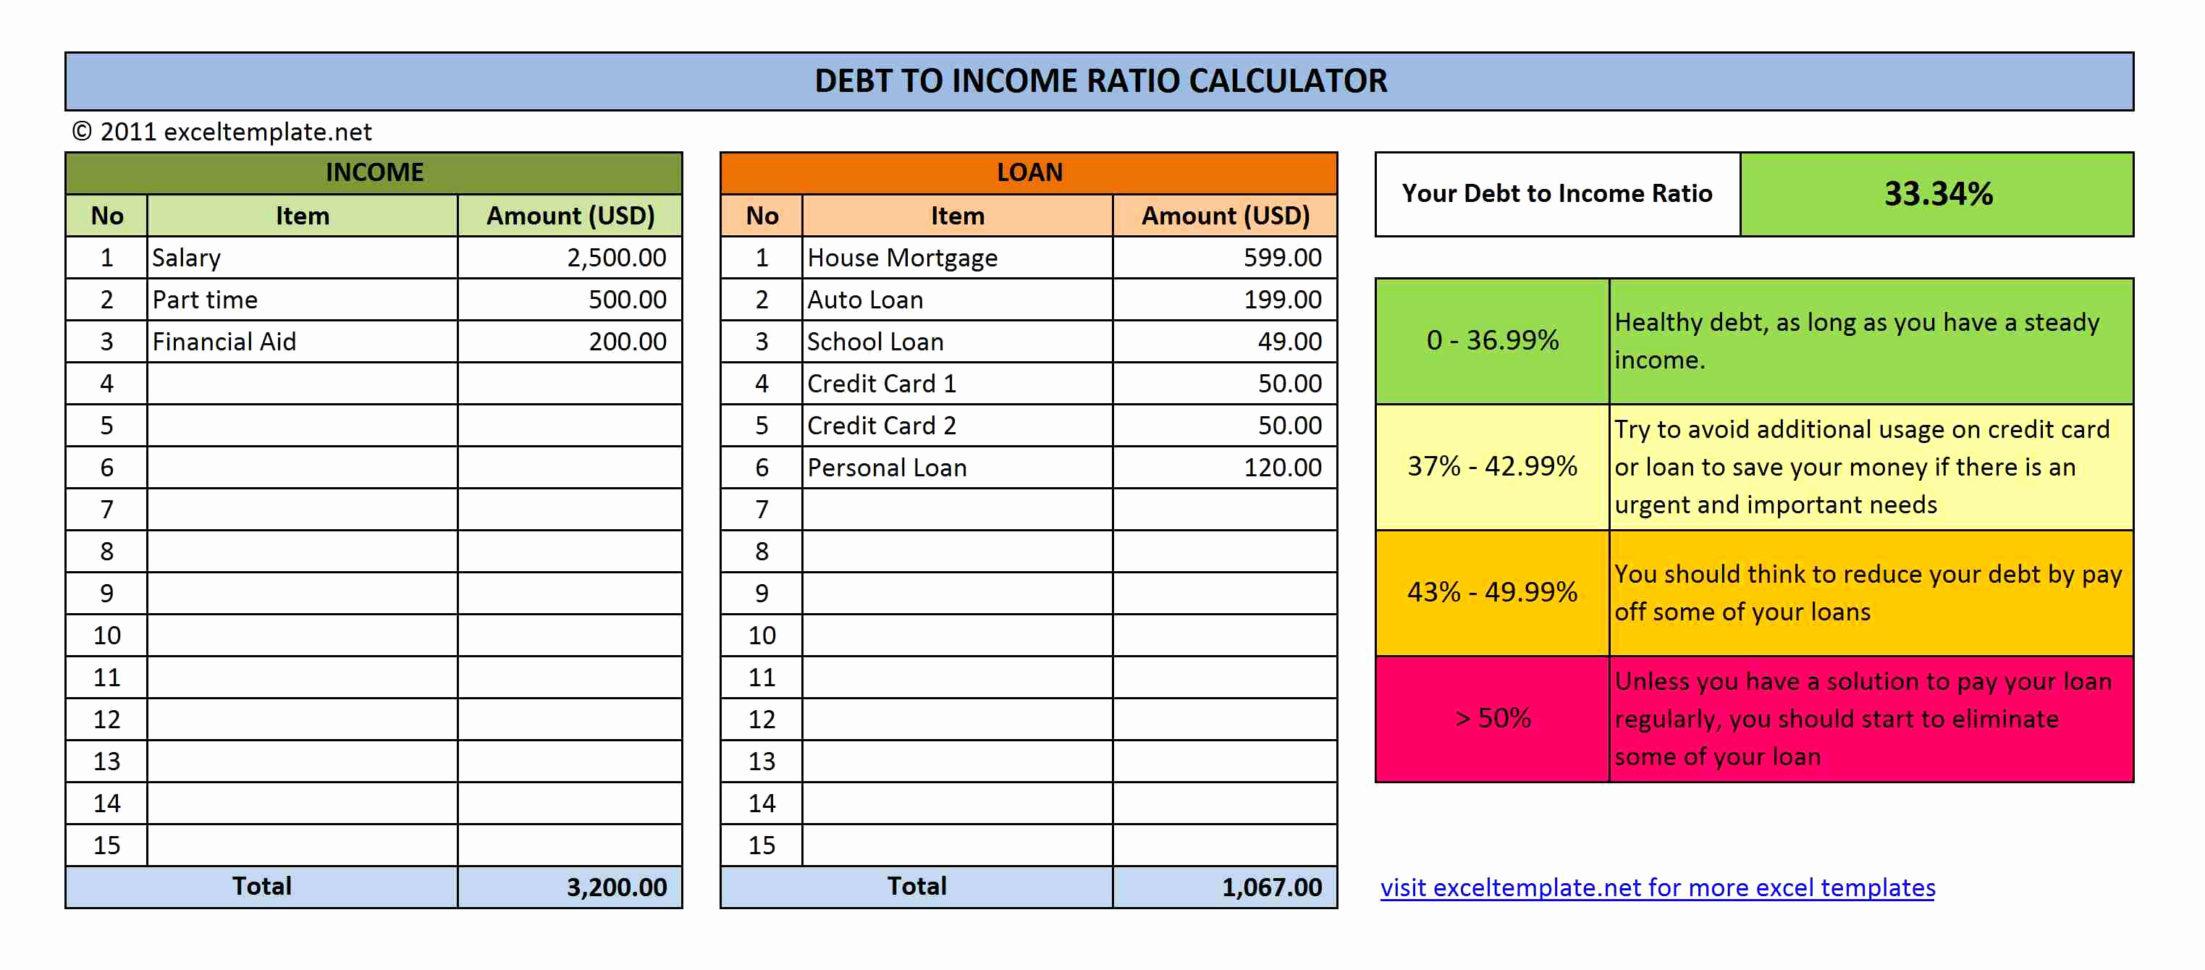 Budget Calculator Spreadsheet Throughout Budget Calculator Spreadsheet For 67 Best Image Debt Avalanche